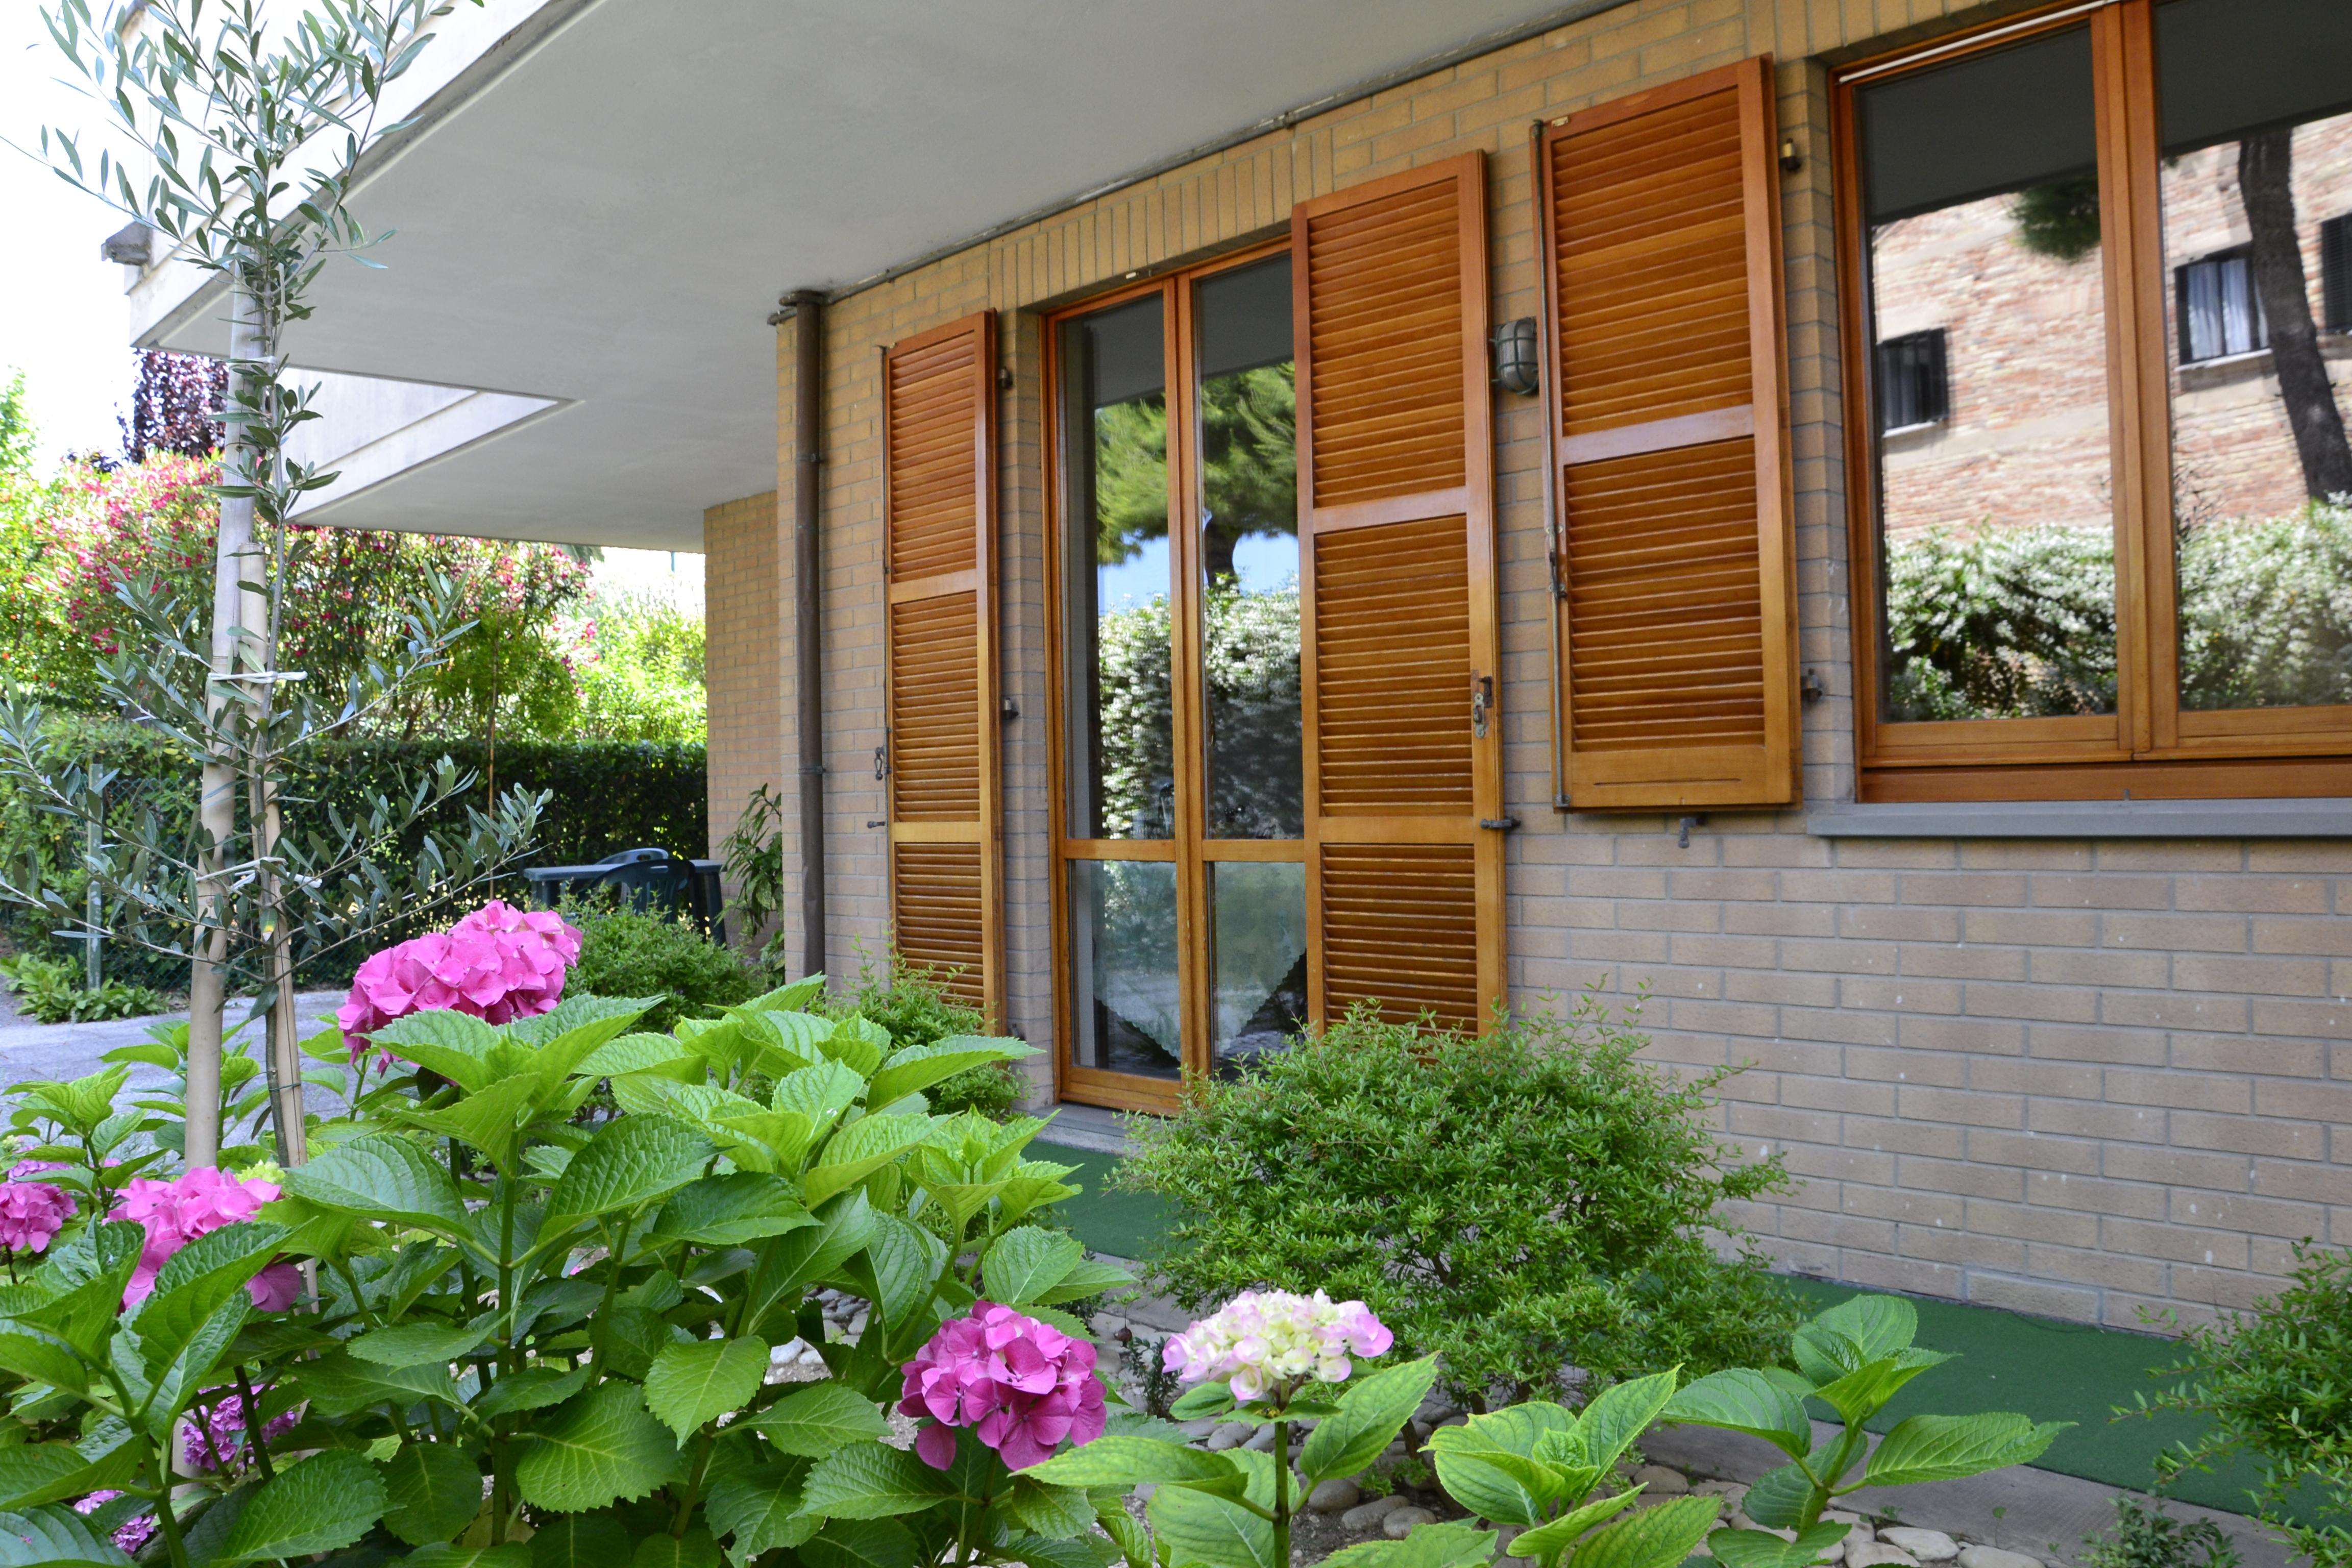 giardino-appartamento-B&B-Girovagando-Porto-Sant-Elpidio-